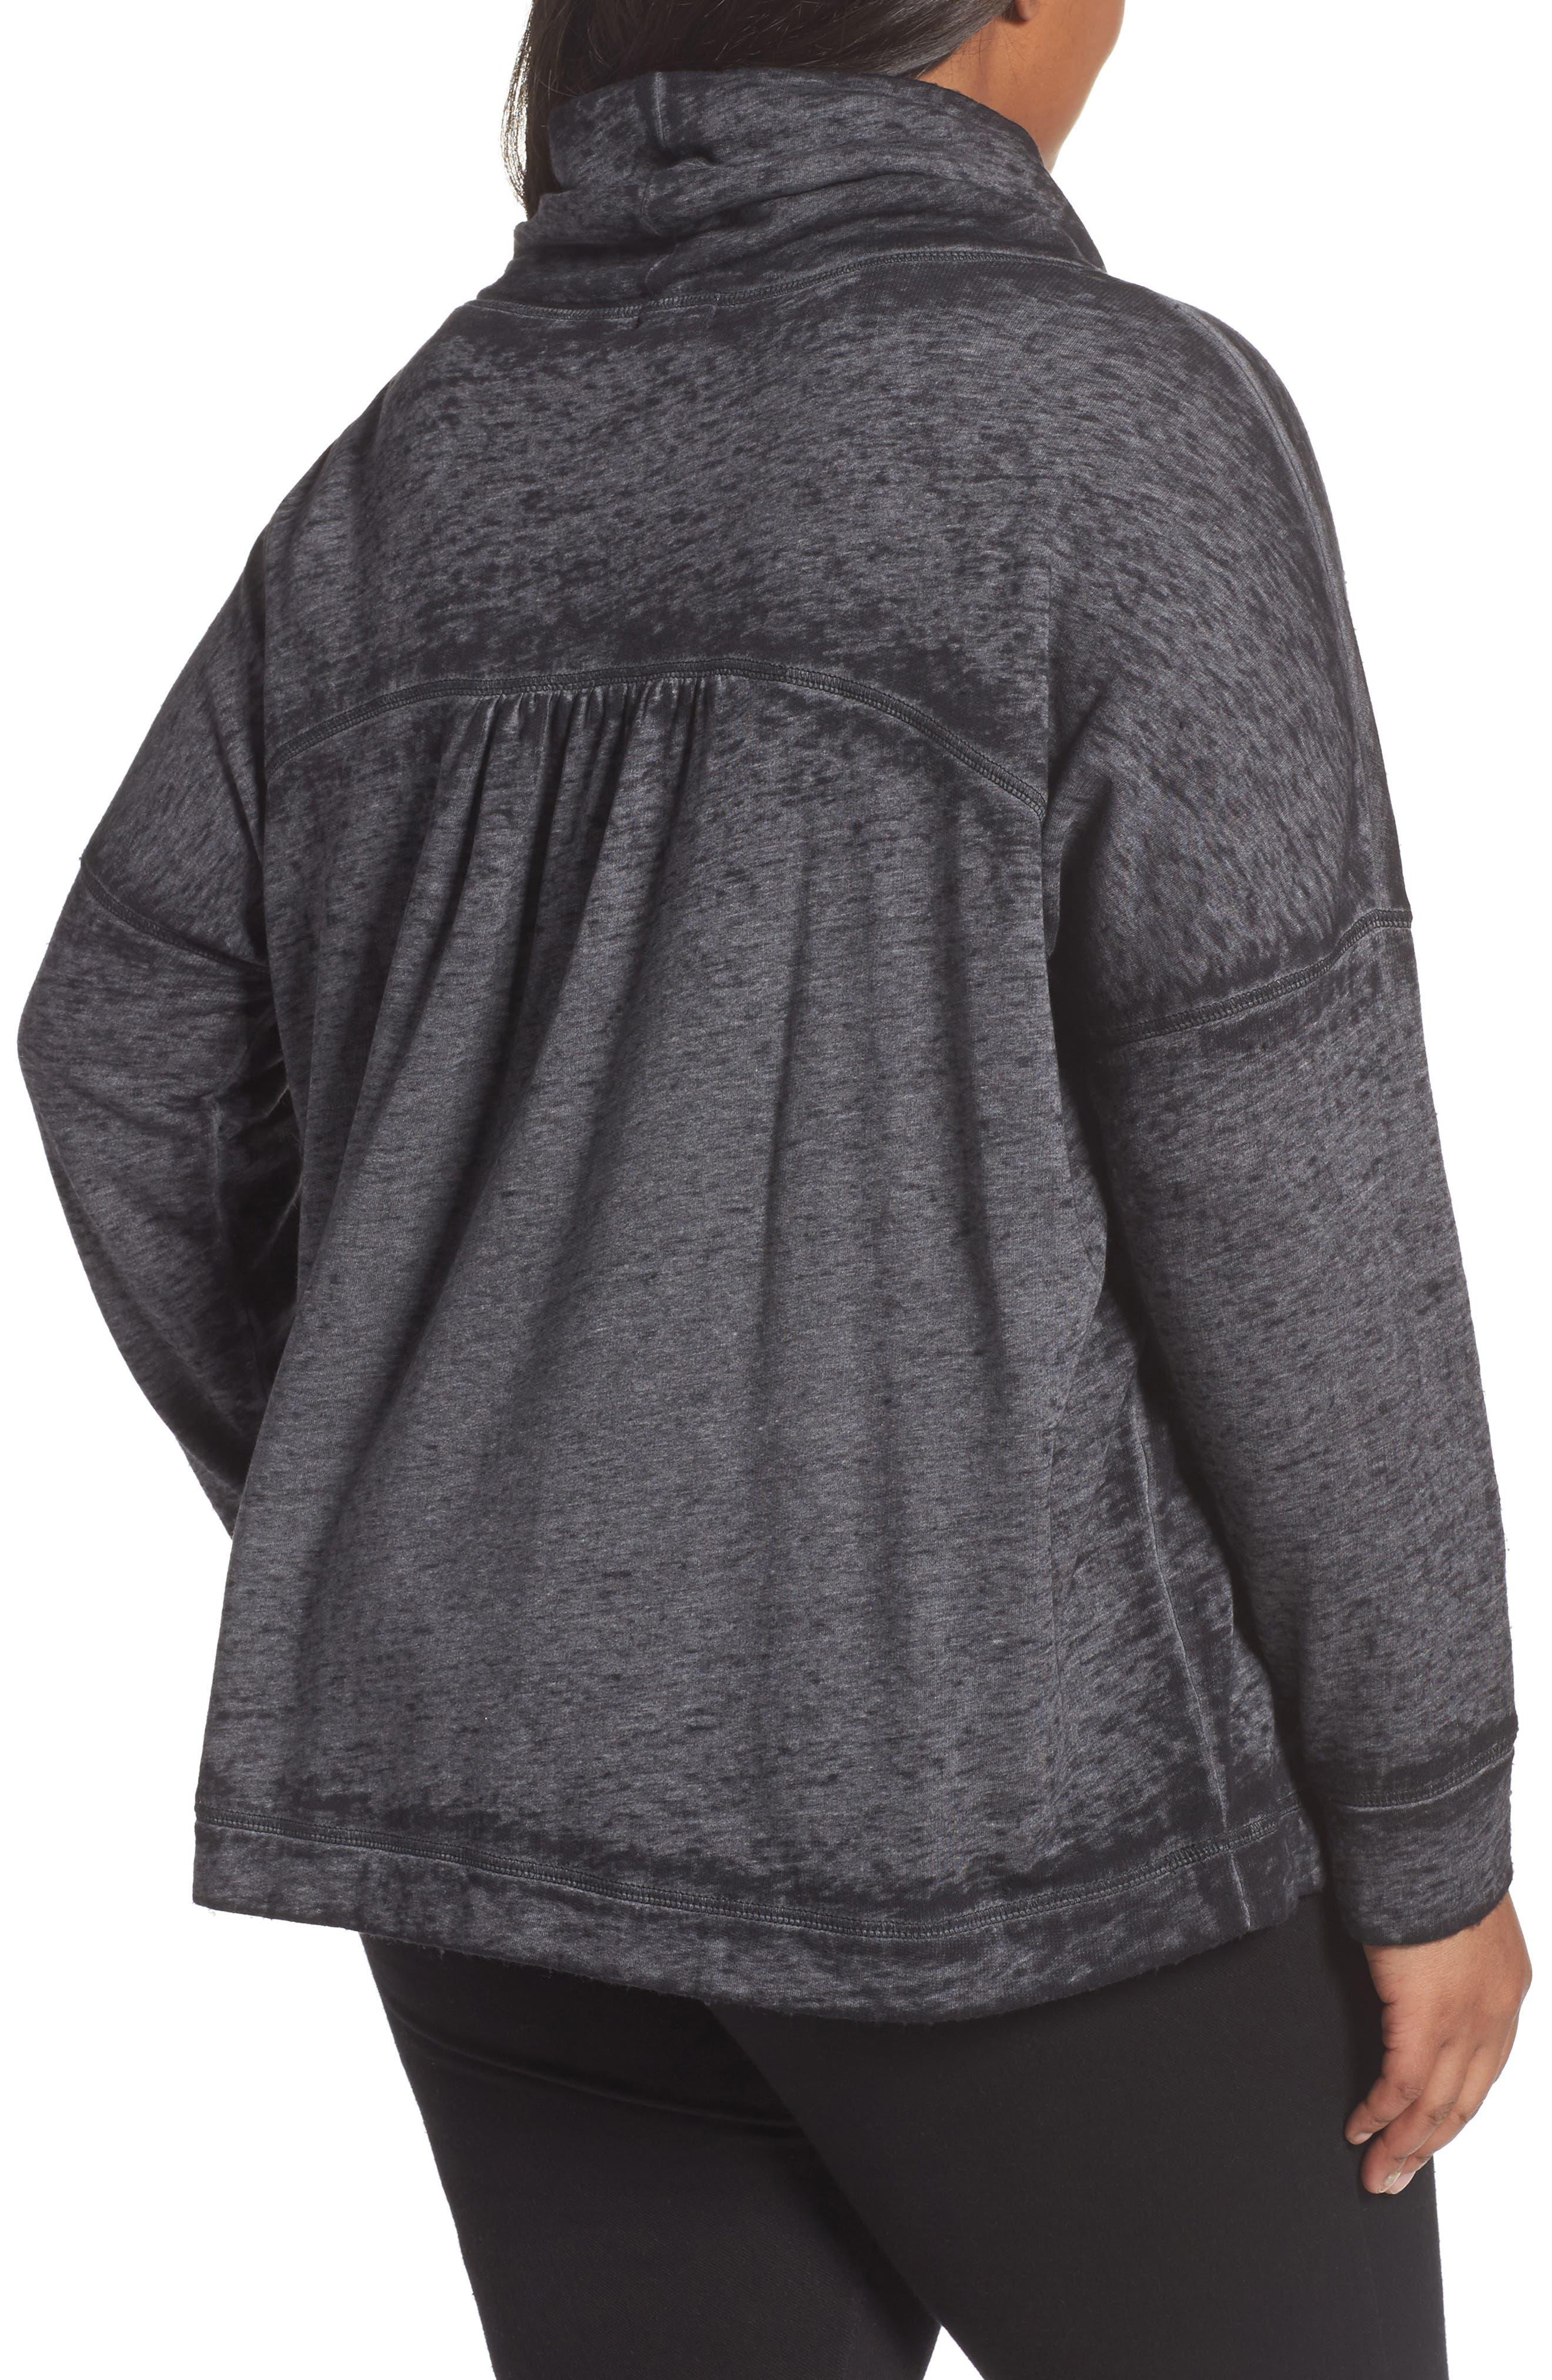 Pleat Back Sweatshirt,                             Alternate thumbnail 2, color,                             001